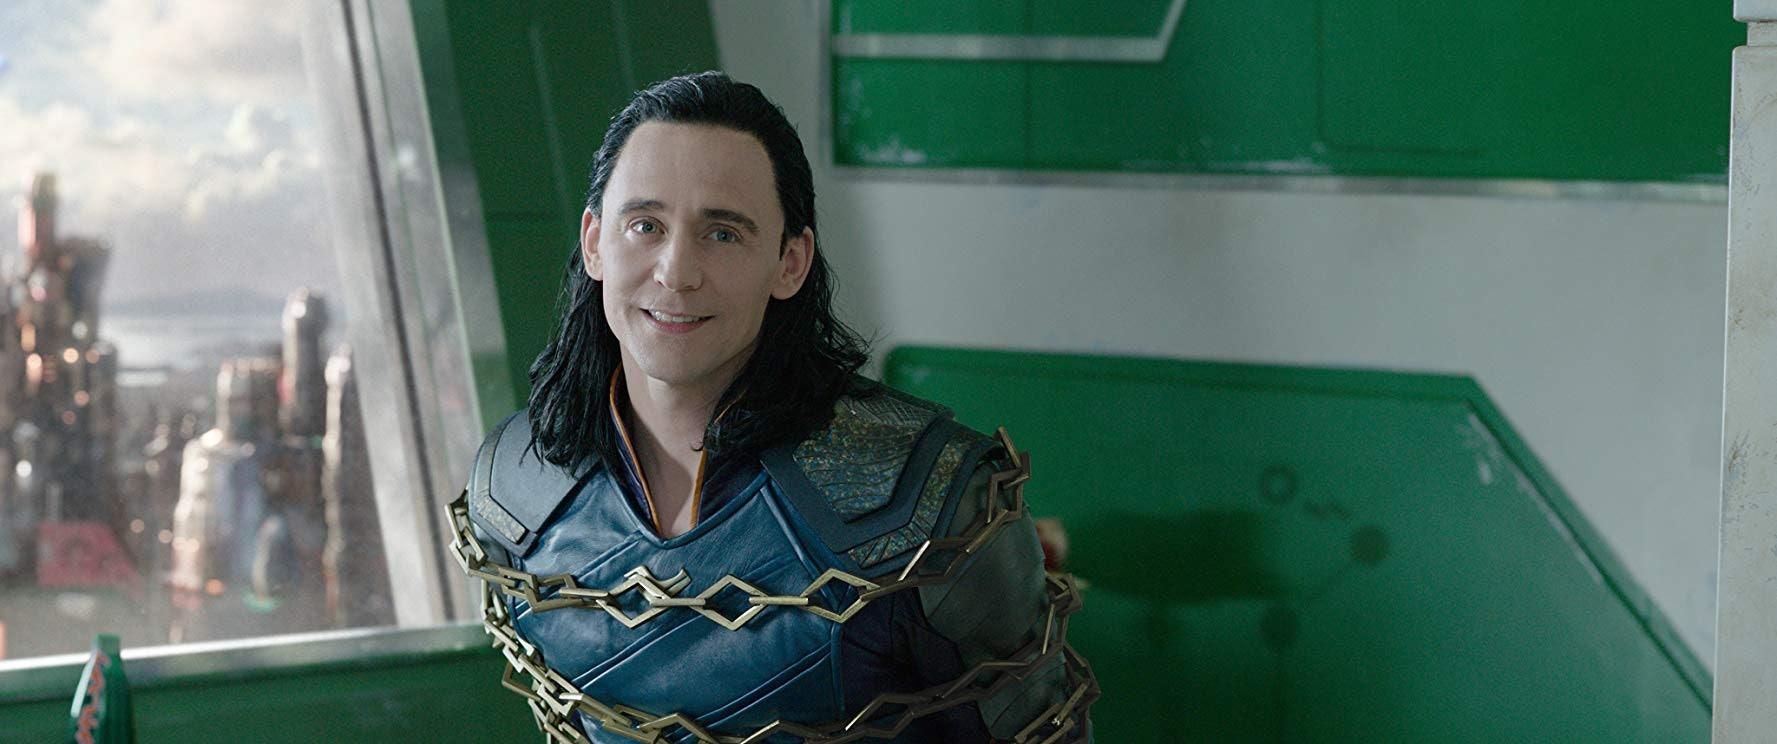 Tom Hiddleston as captured Loki in Thor: Ragnarok